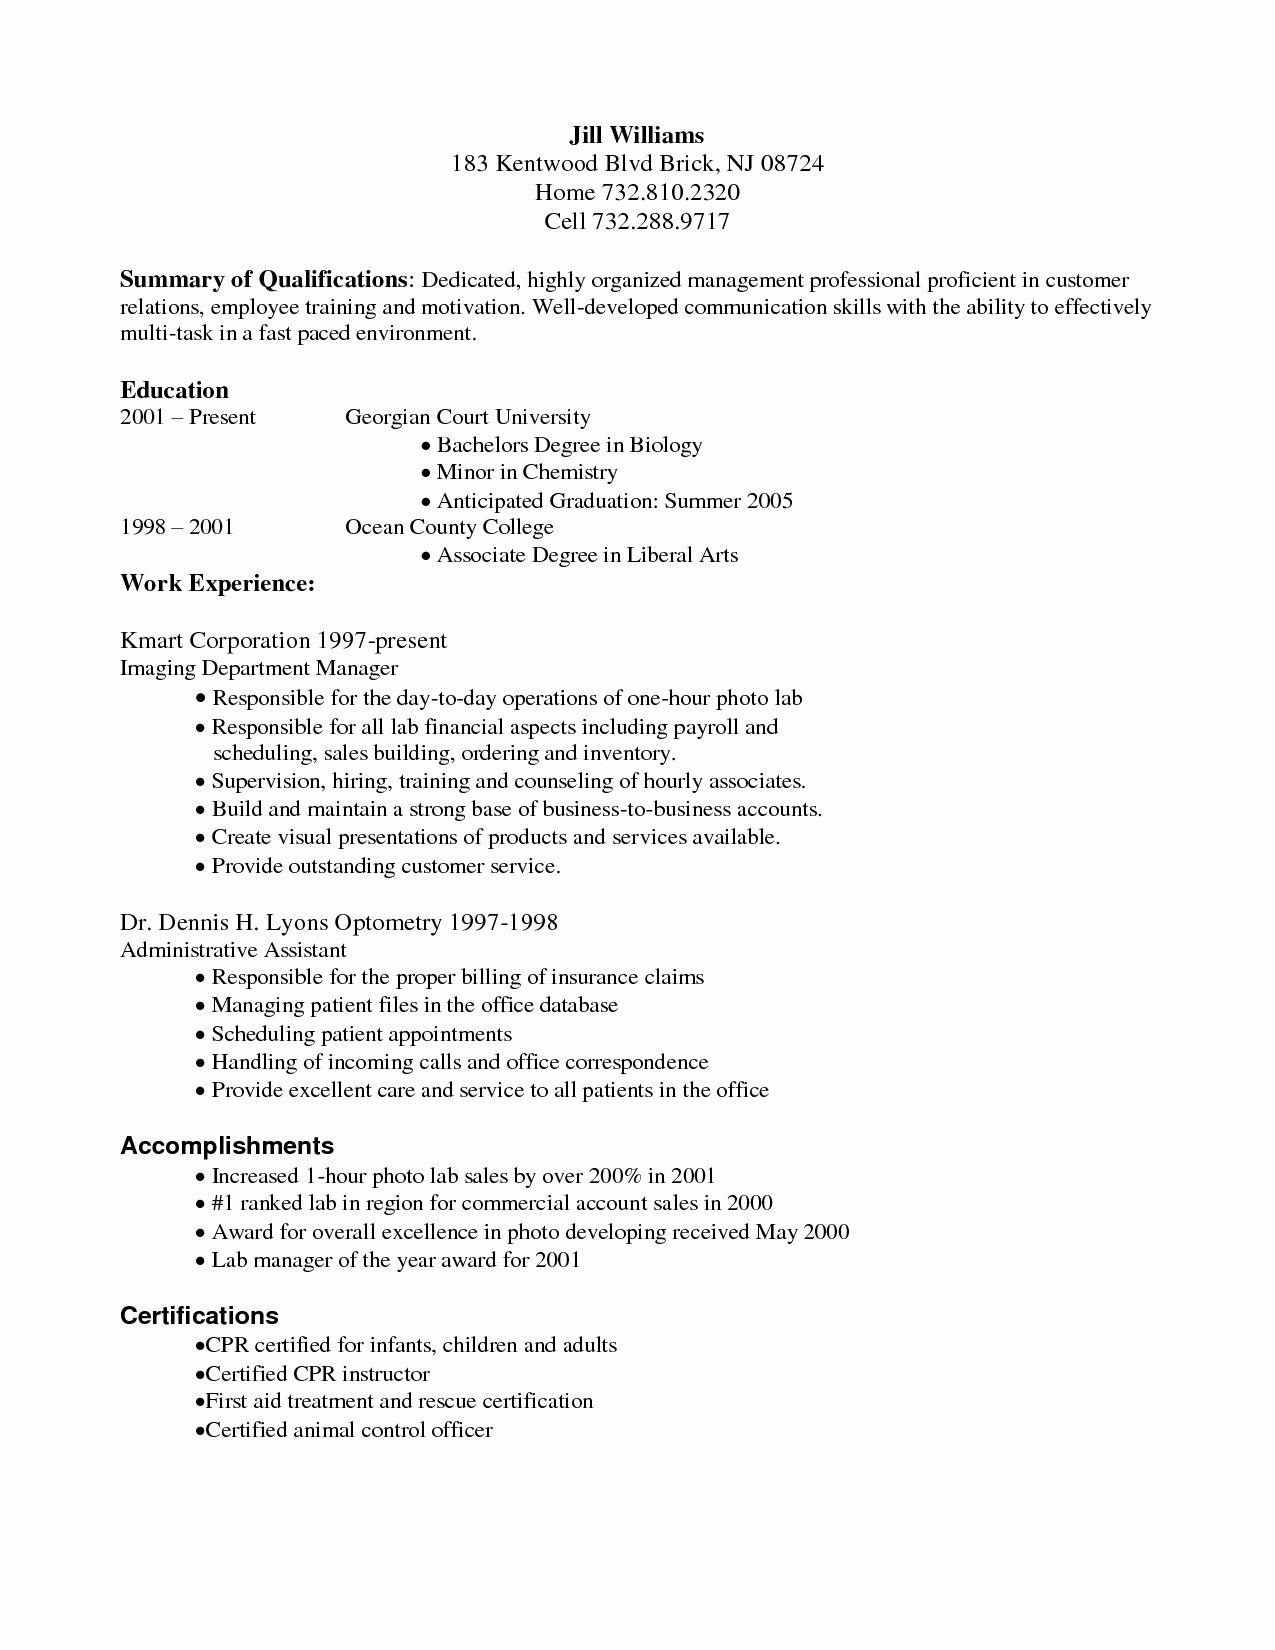 Medical biller resume examples awesome medical billing and